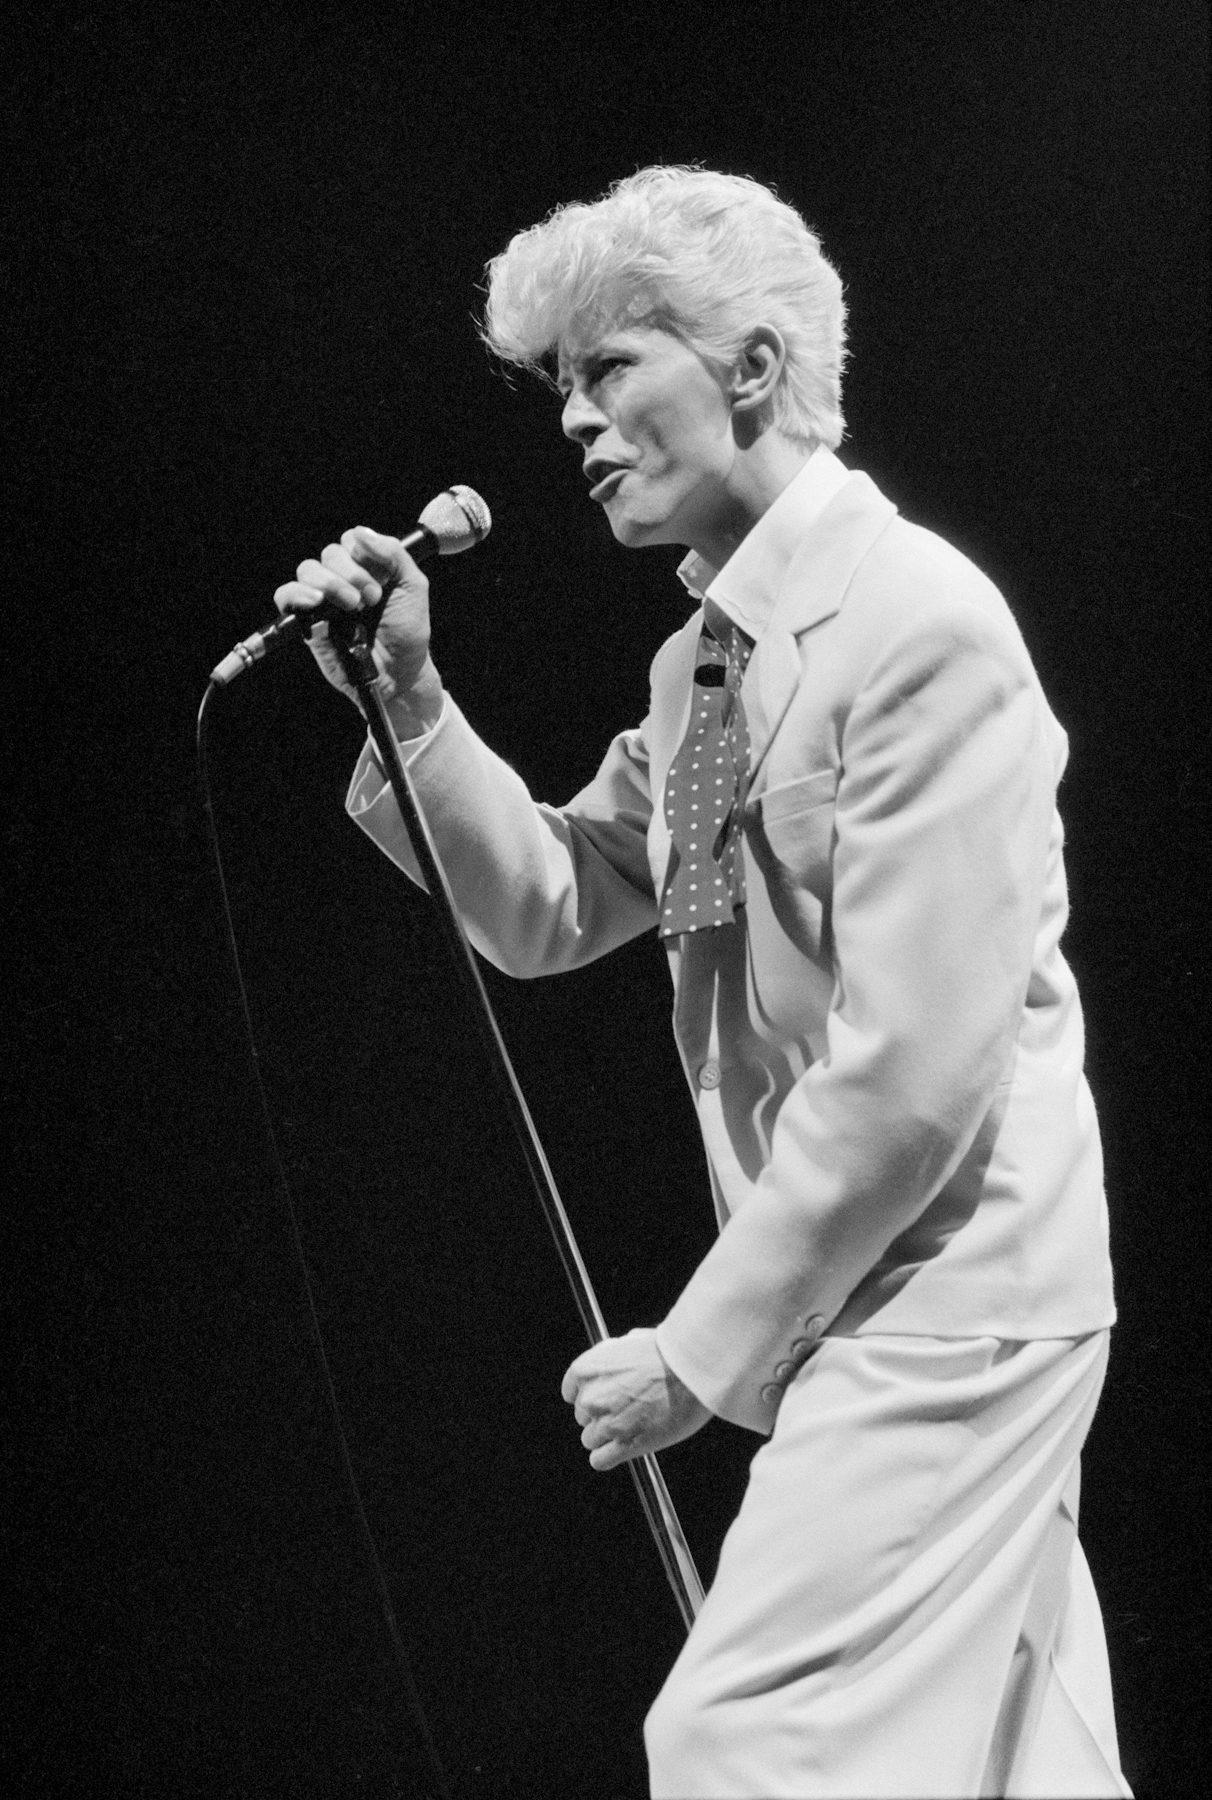 David Bowie at the Garden